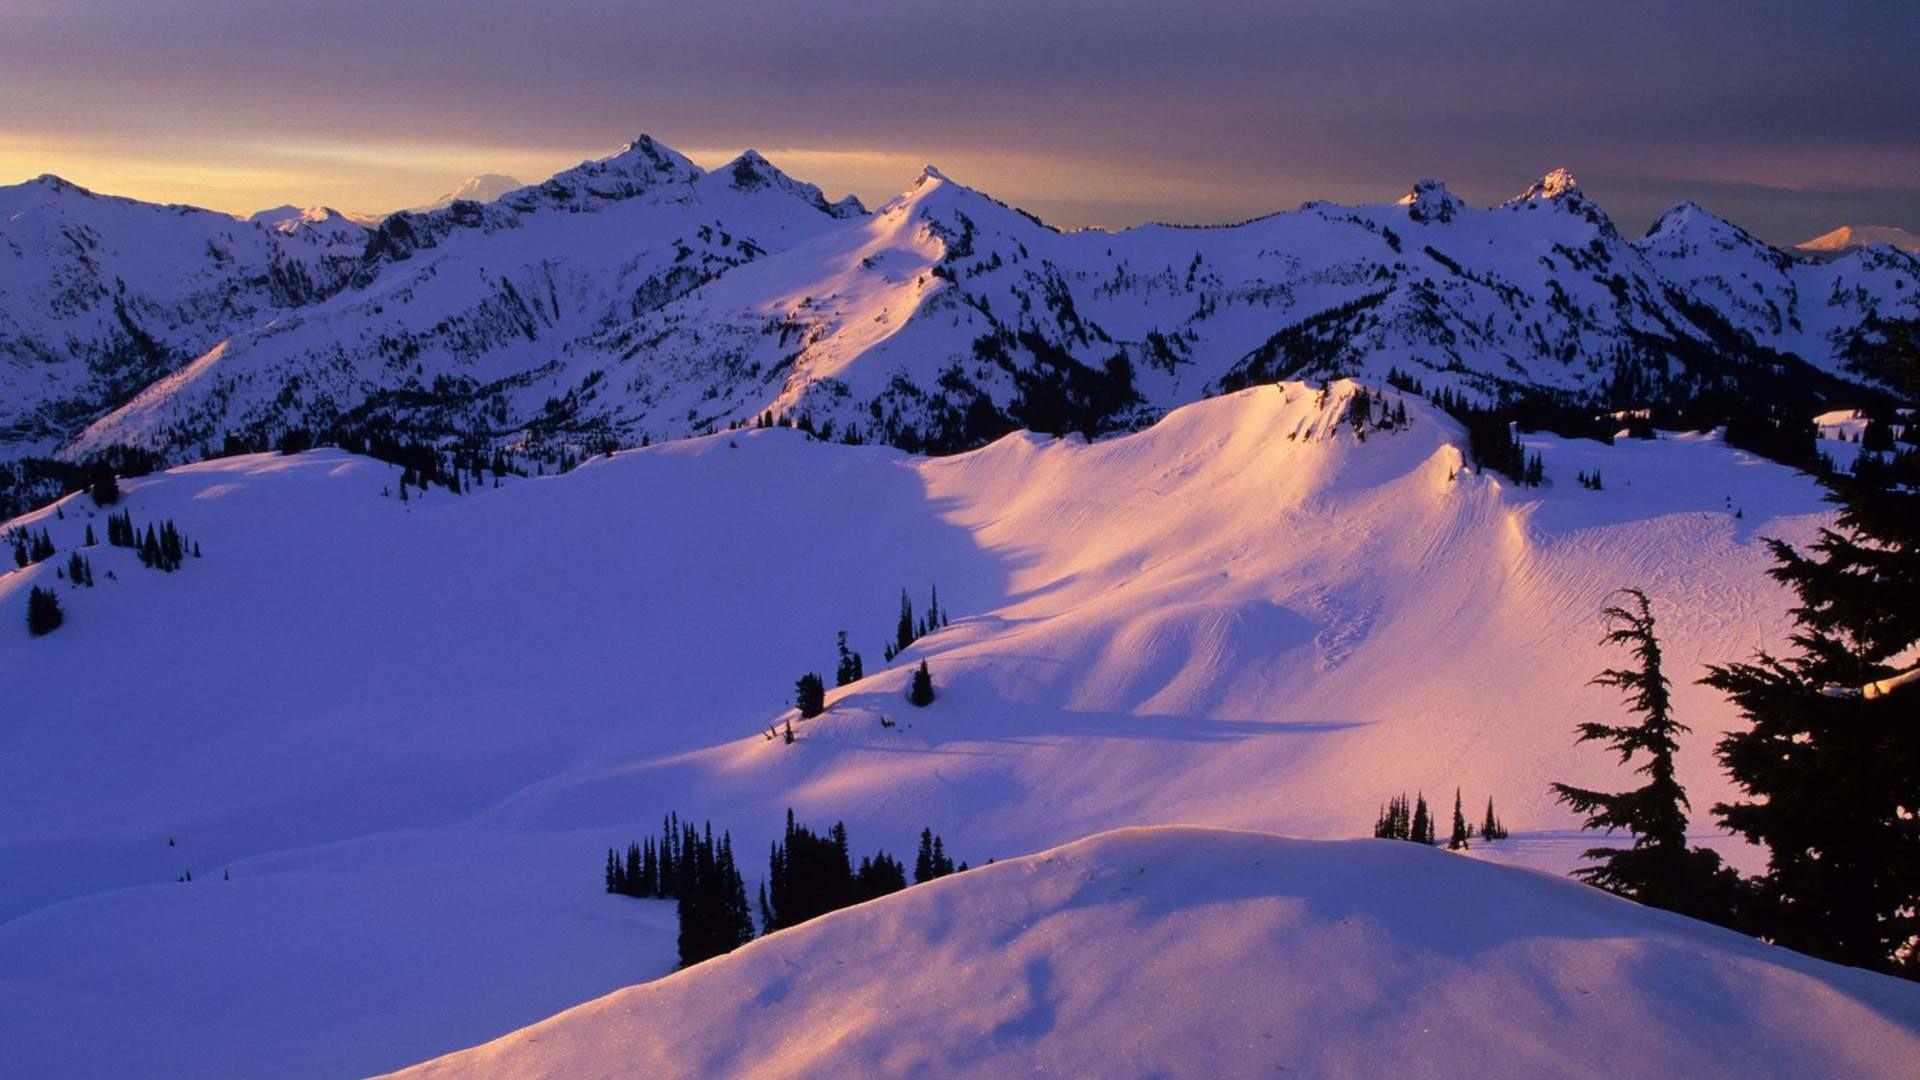 Beautiful Snowy Mountain Winter Wallpaper.